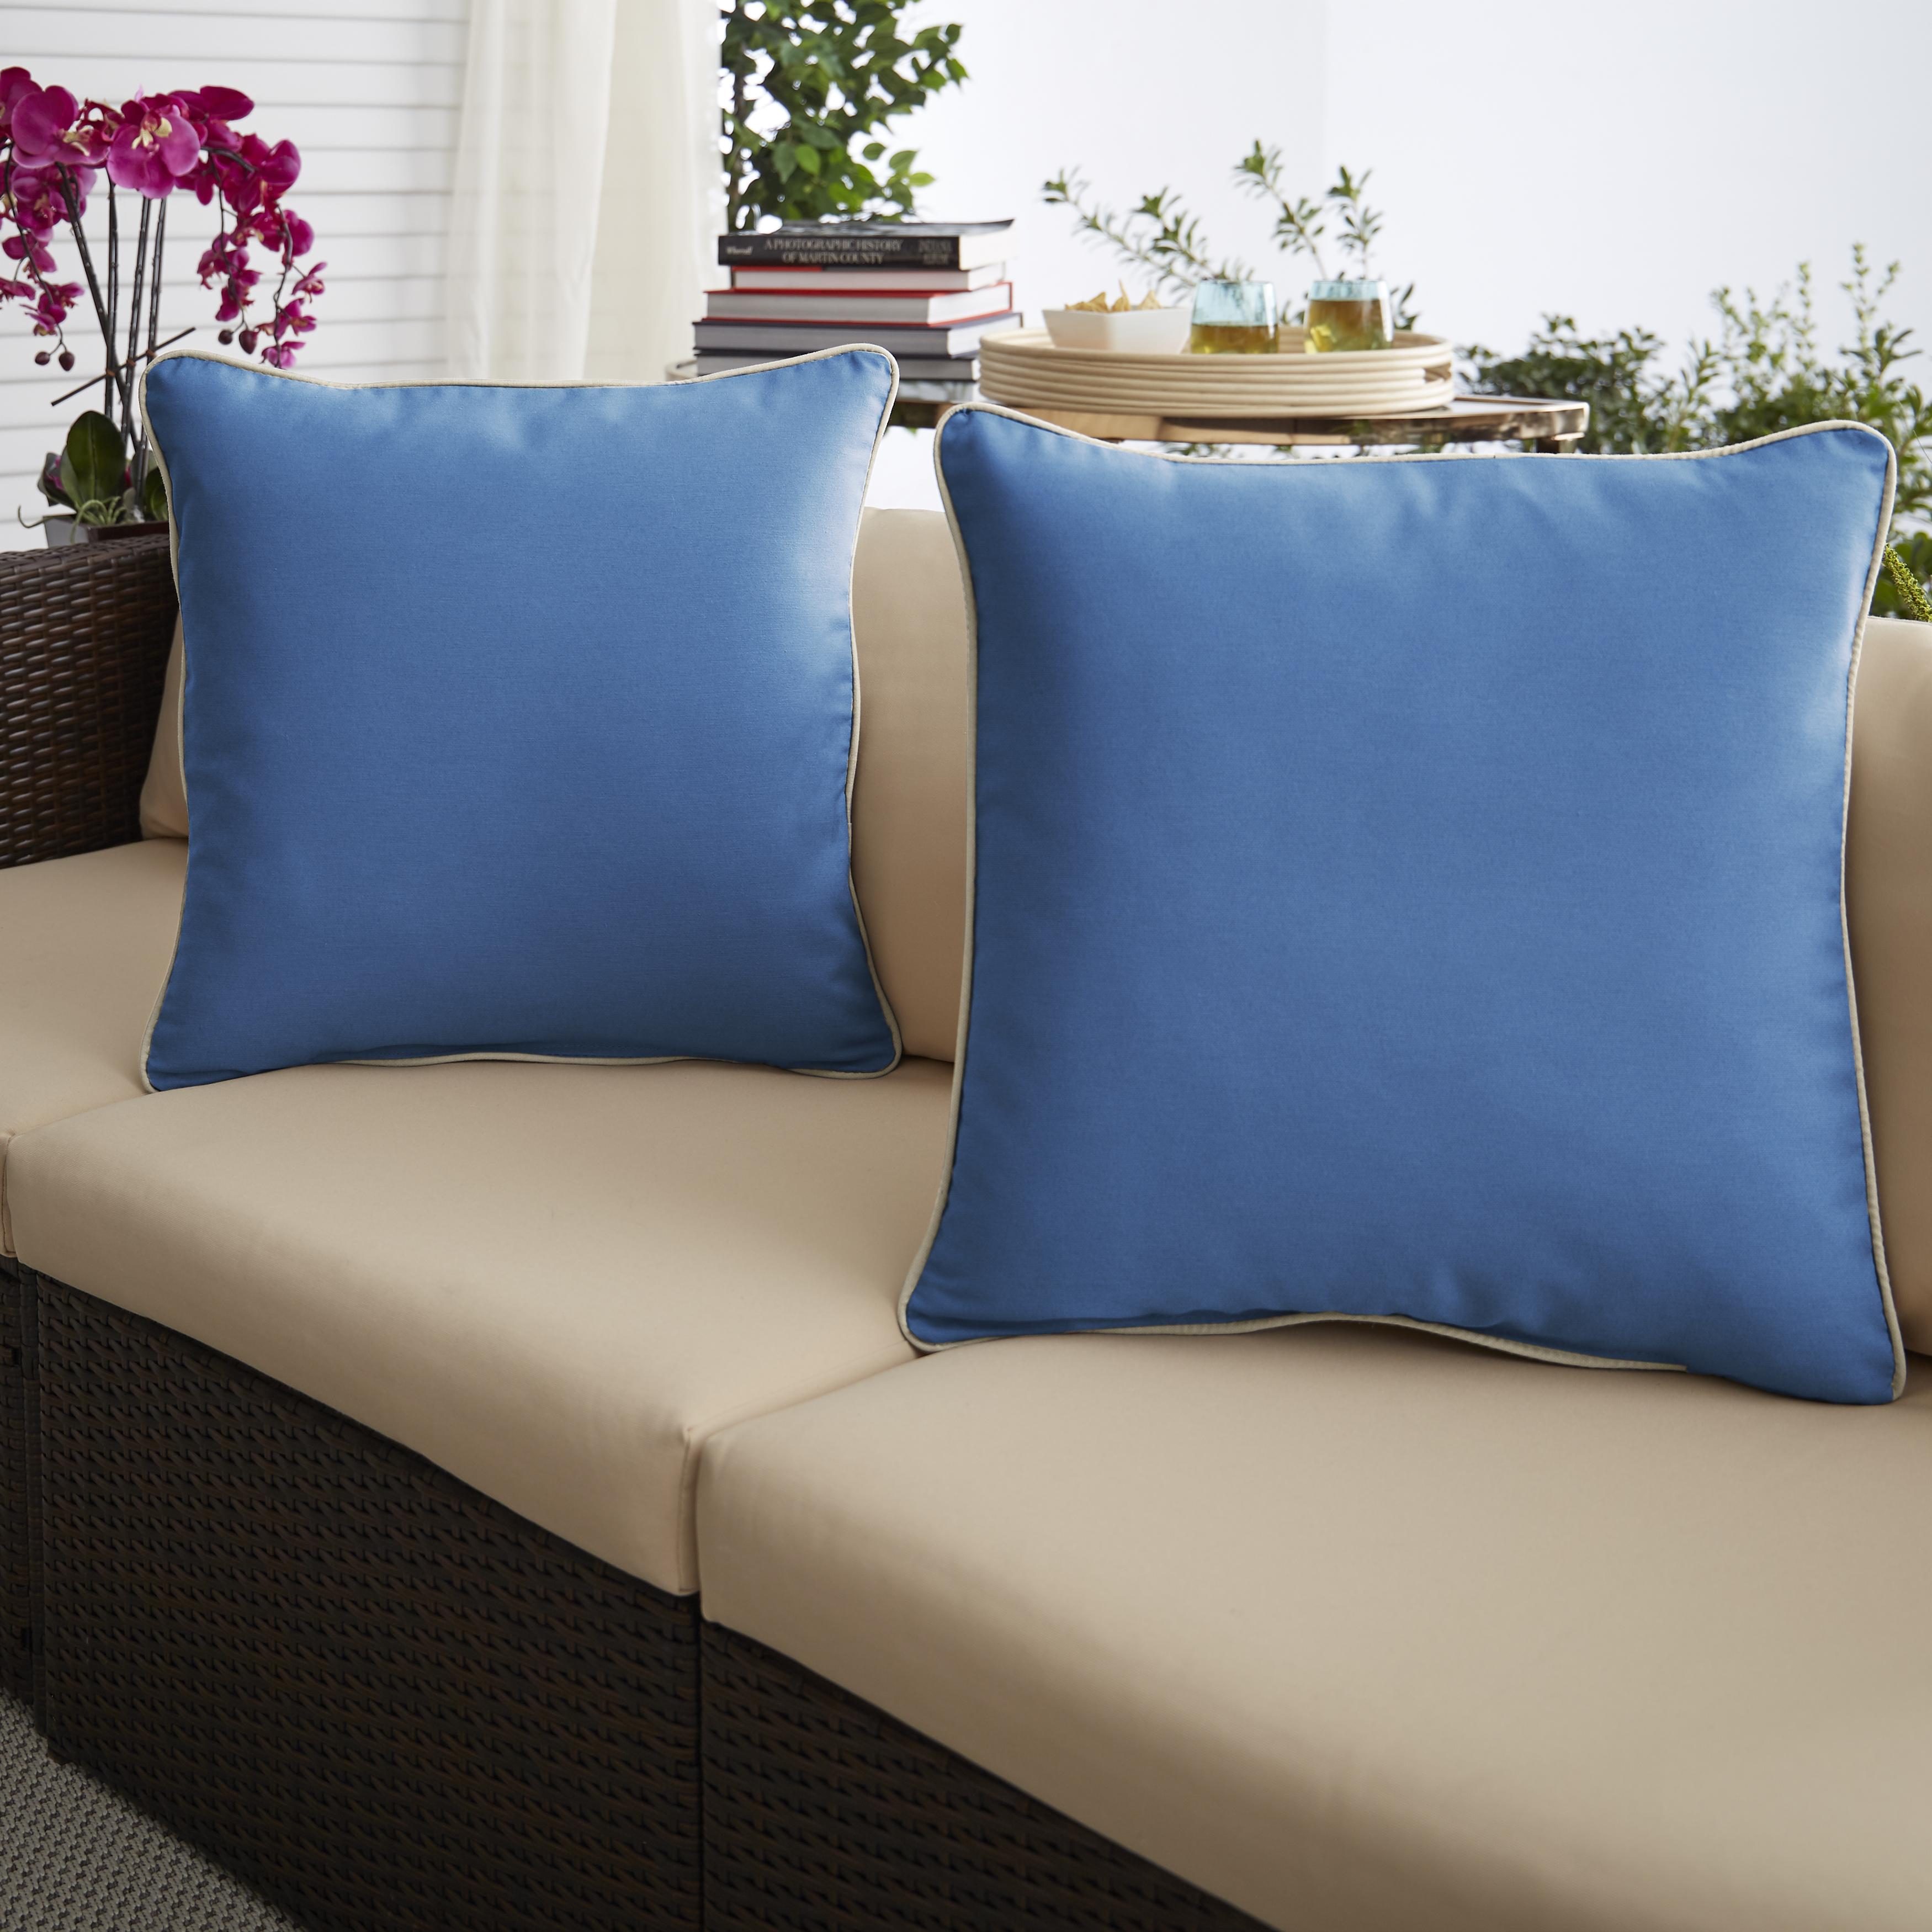 Light Blue/Ivory Set of 2 Outdoor Pillows